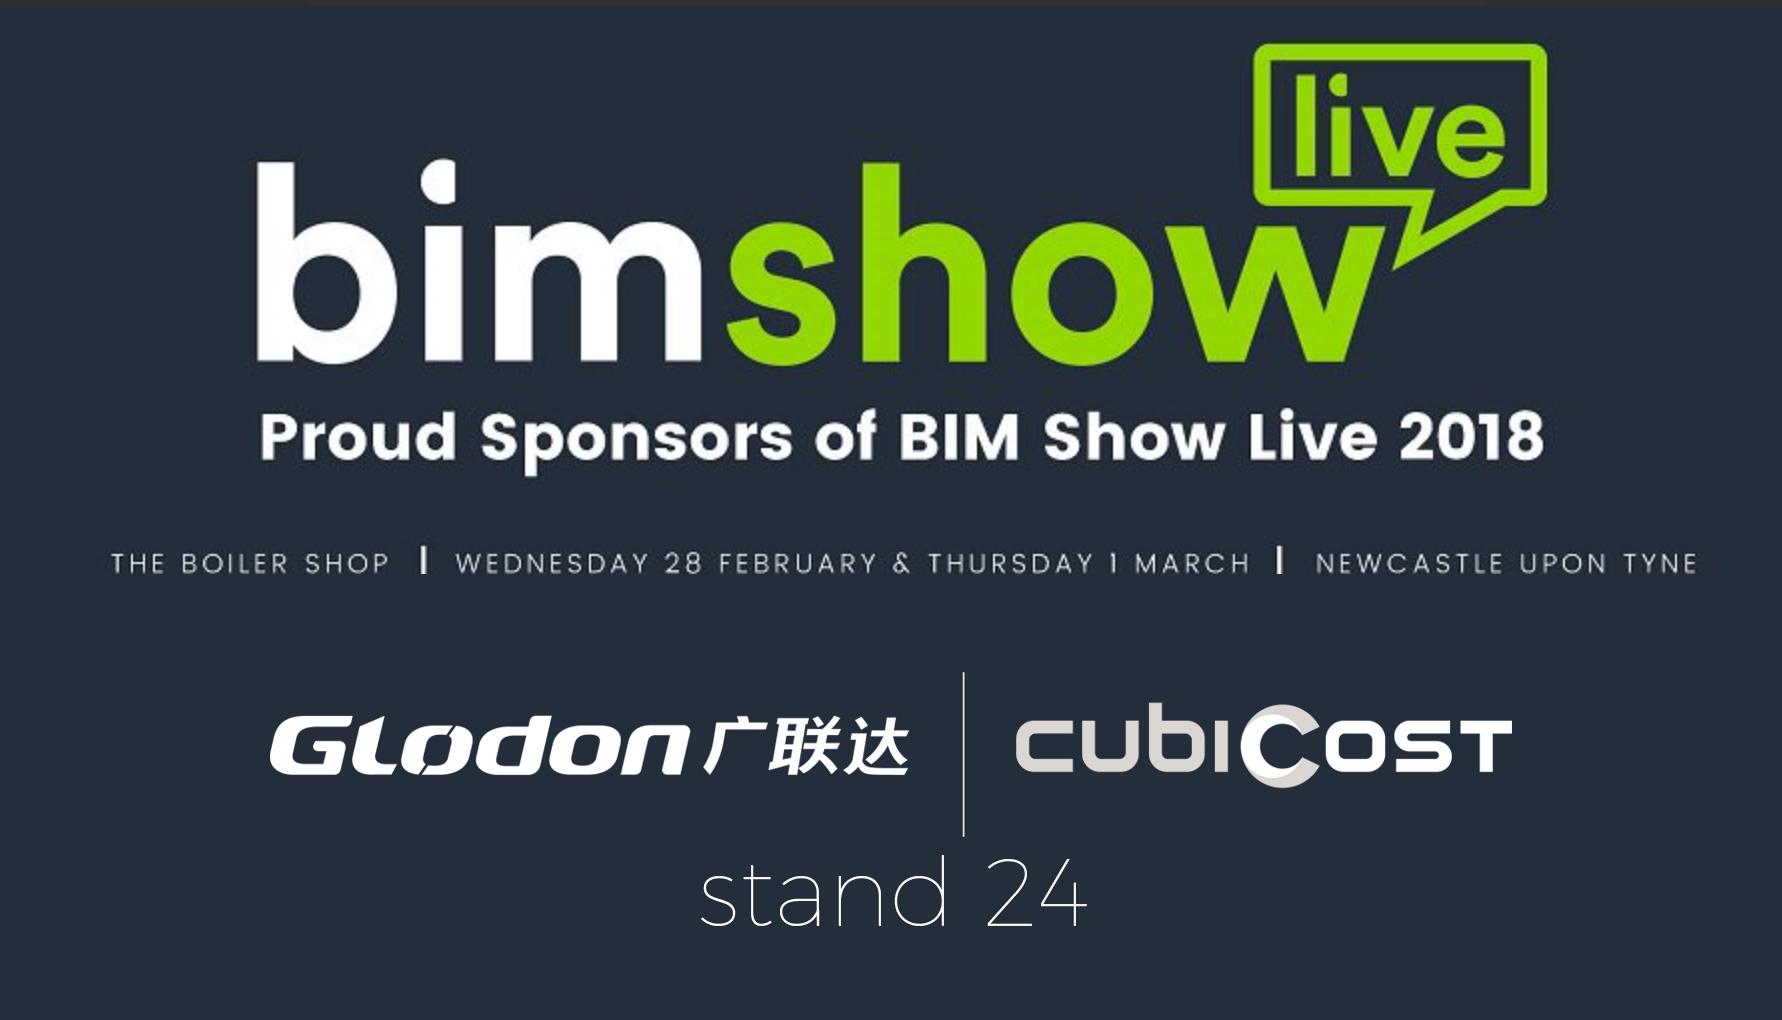 BIM_Show_Live_2018_Cubicost_Glodon